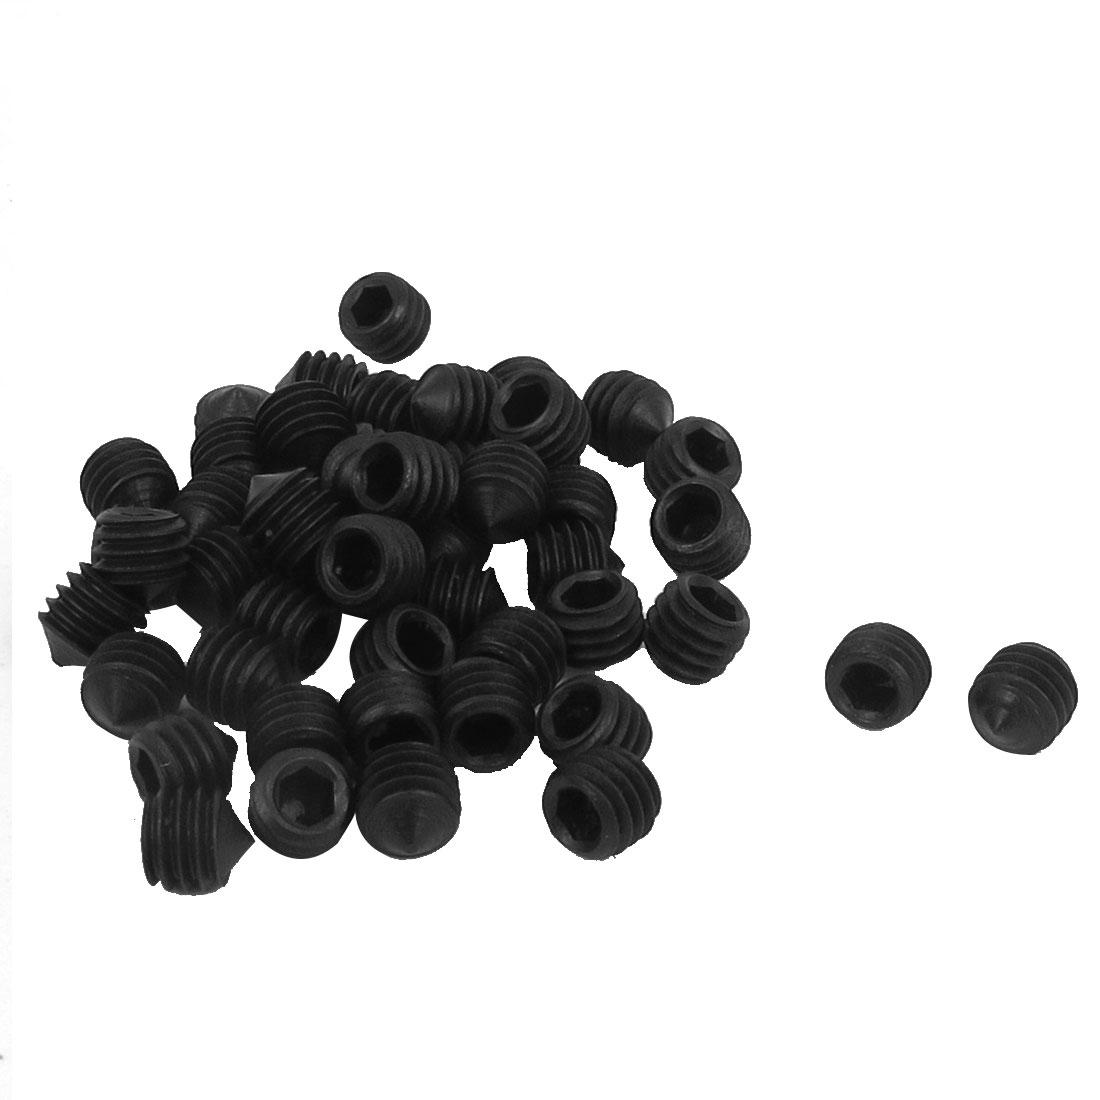 M6x6mm 1mm Pitch 12.9 Alloy Steel Hex Socket Set Cone Point Grub Screws 50pcs